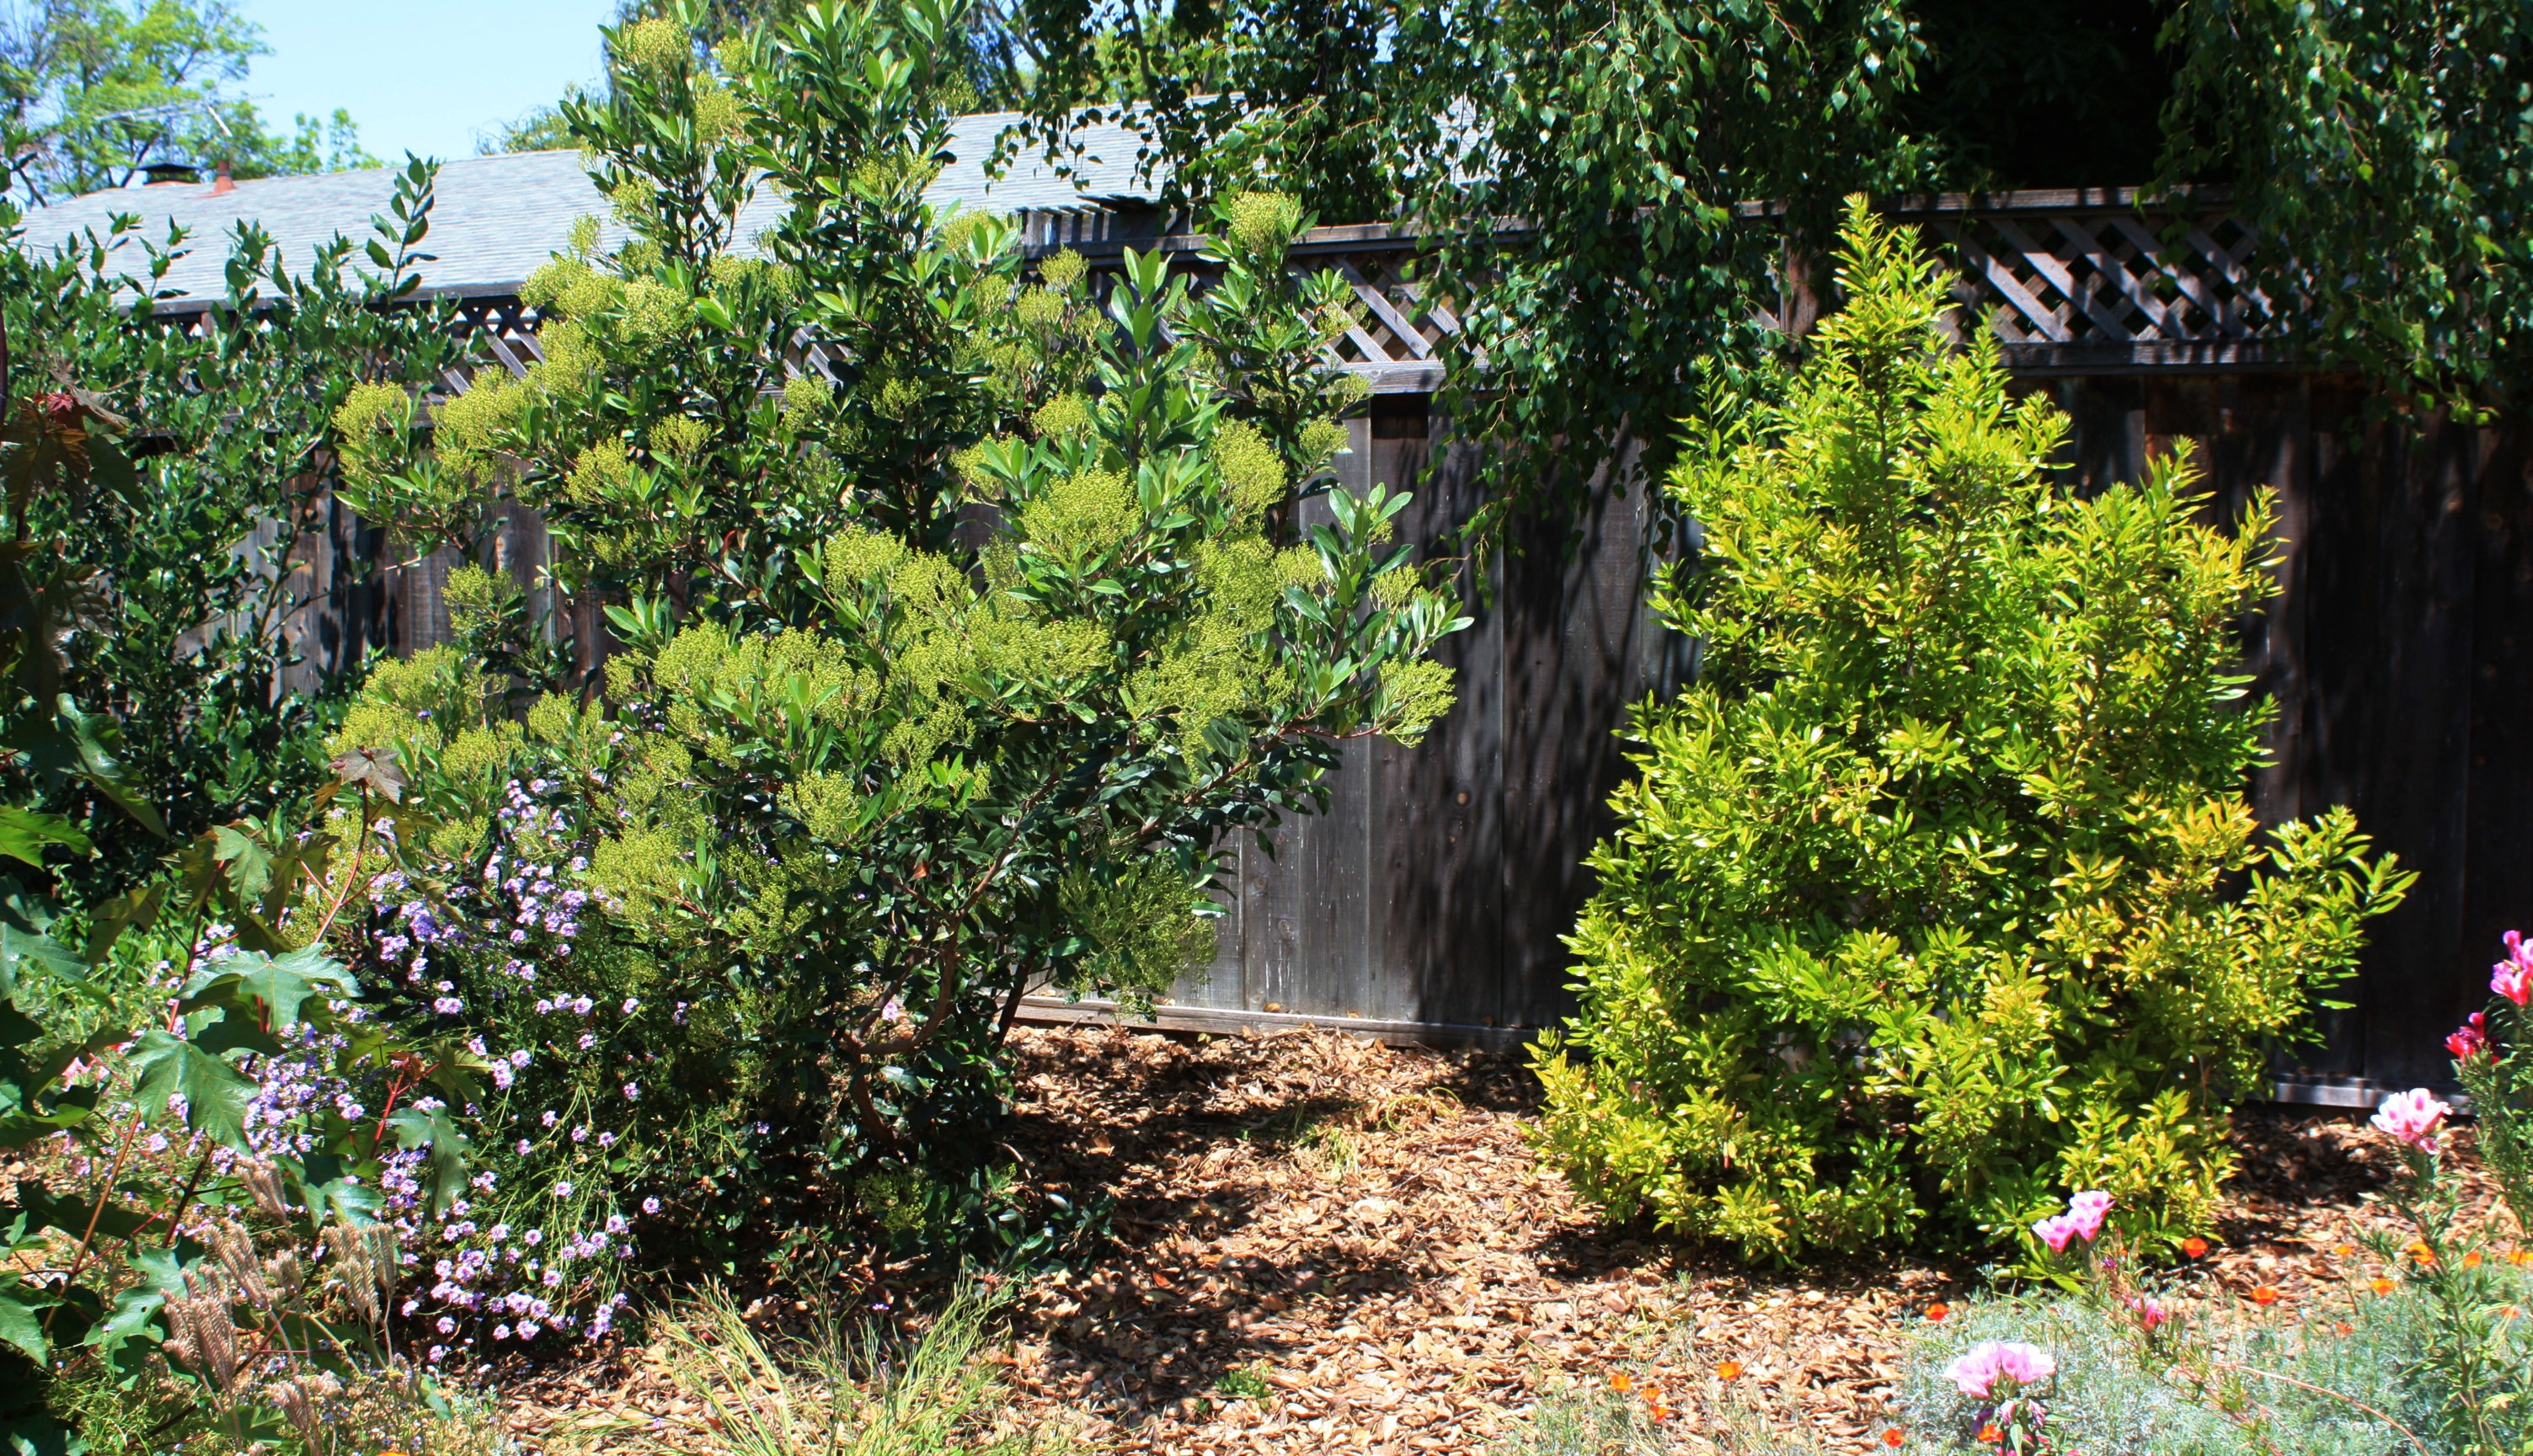 Heteromeles arbutifolia and Morella californica